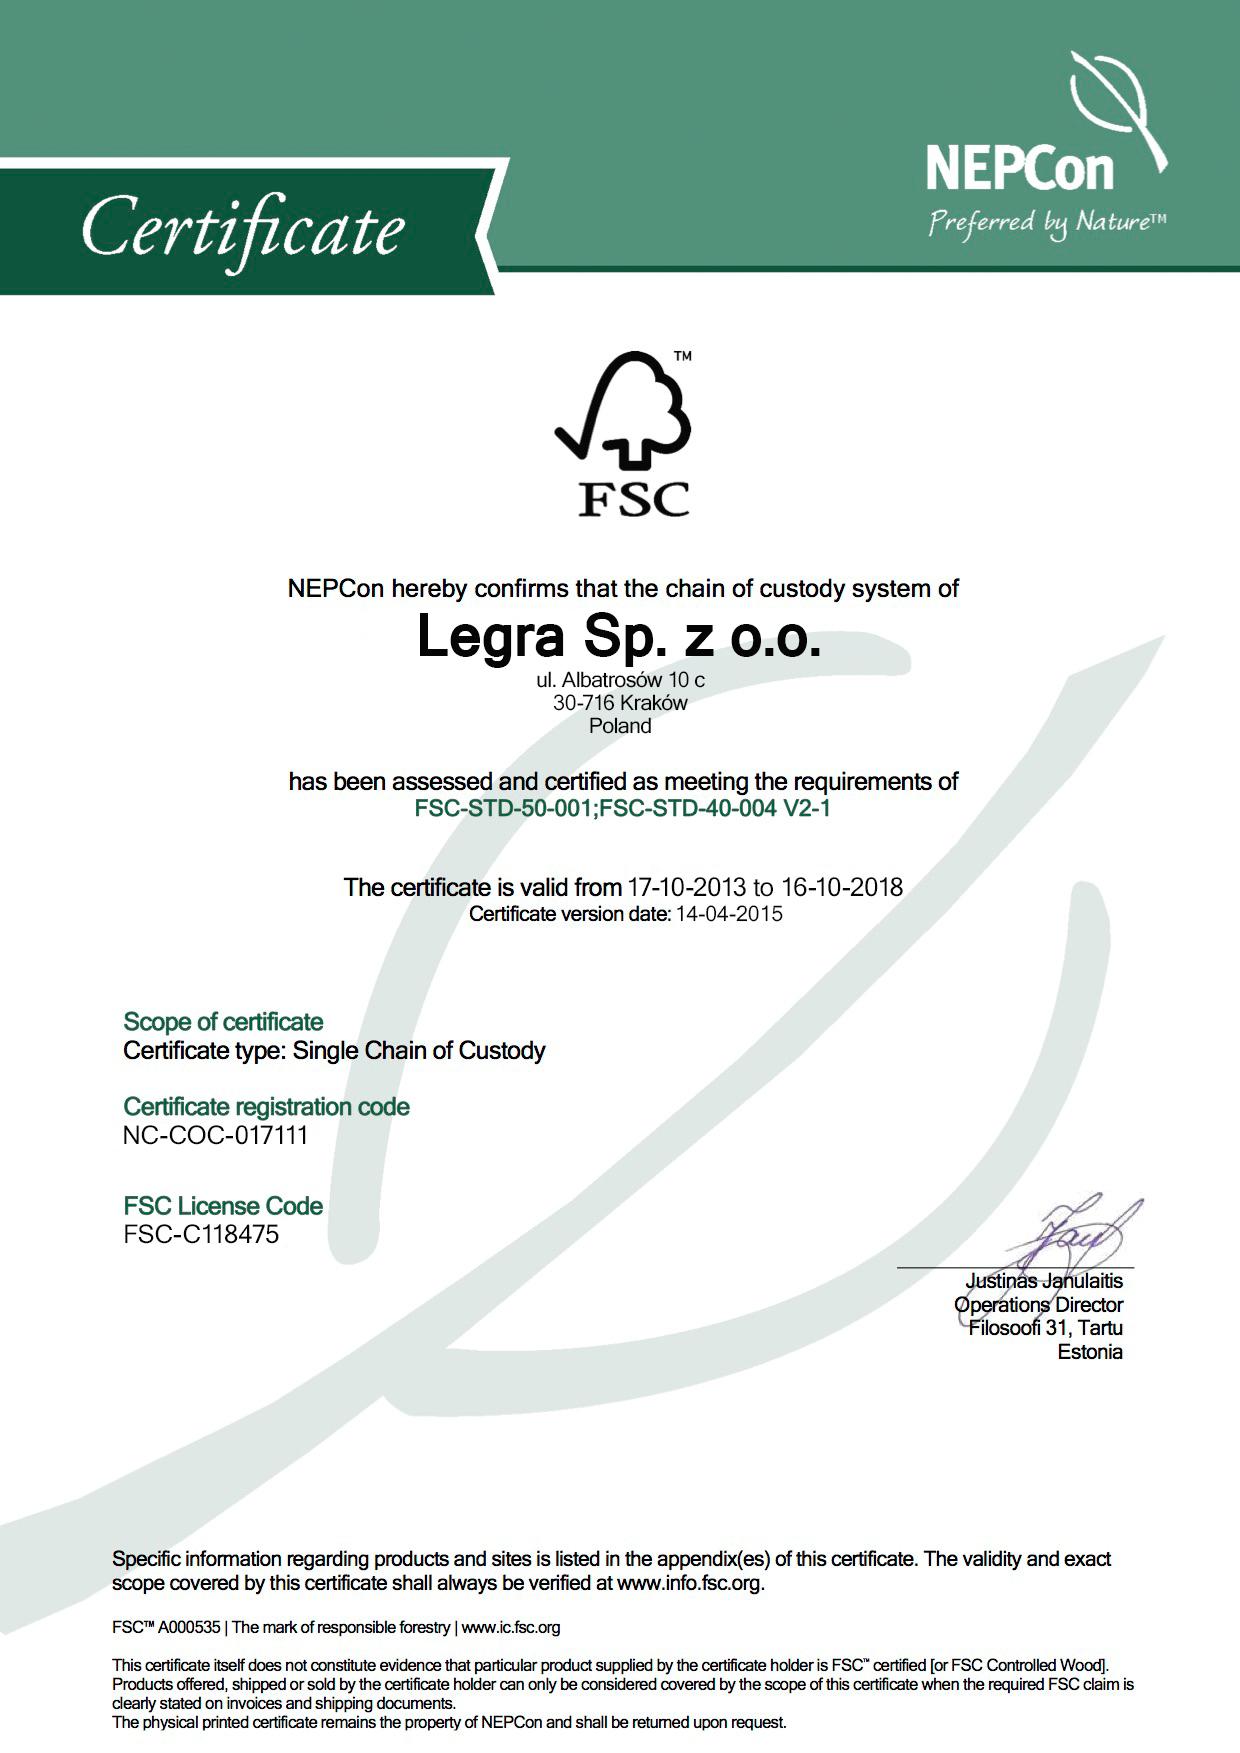 Legra certyfikat FSC